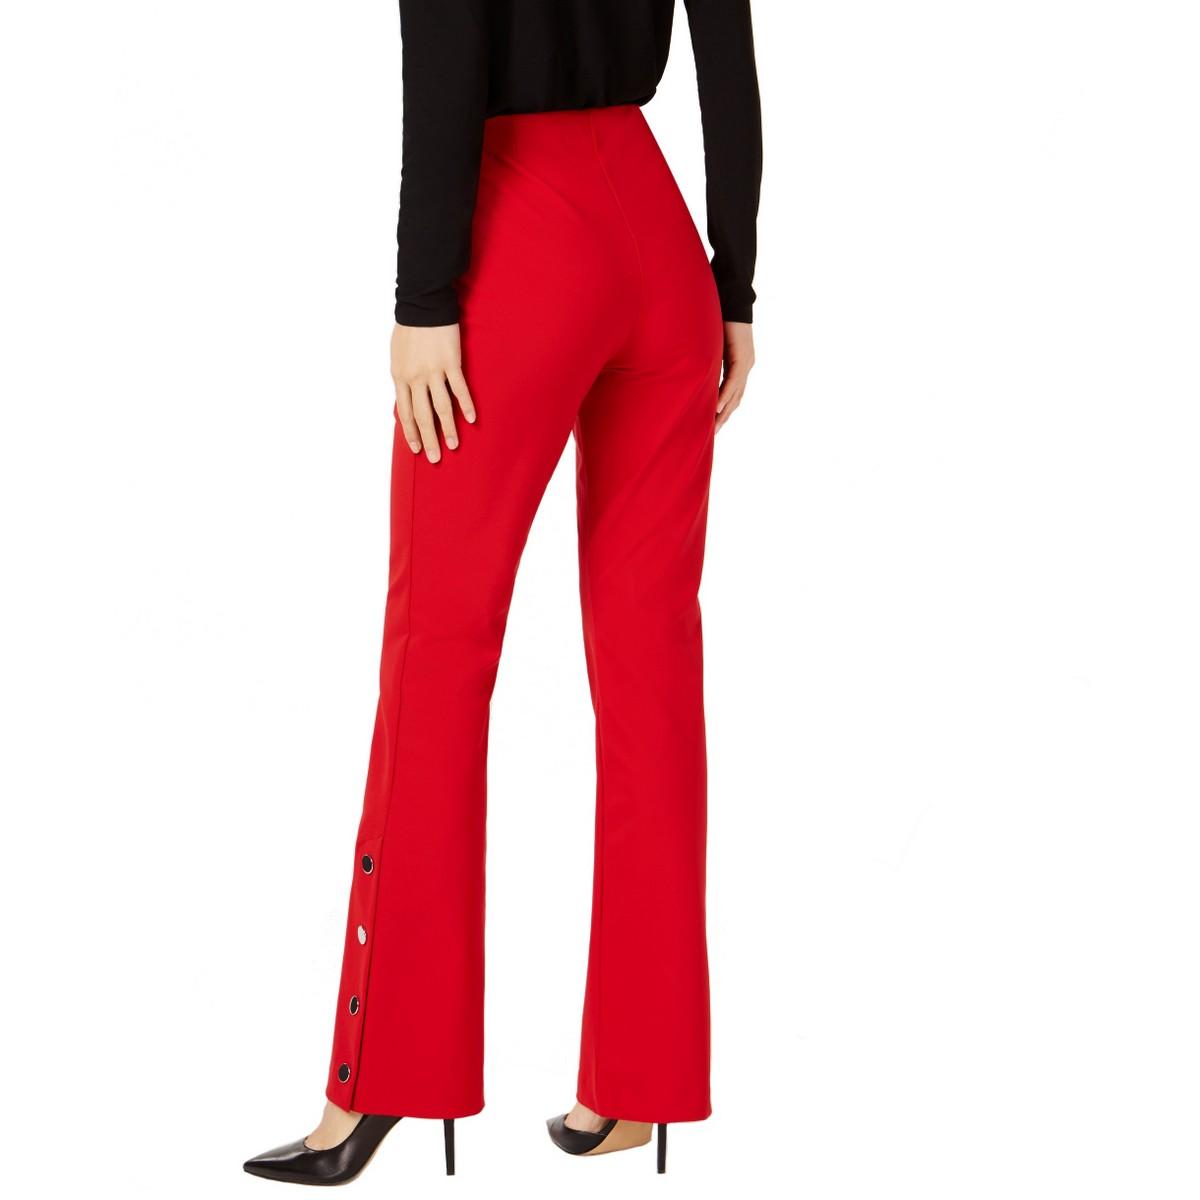 INC-Women-039-s-Embellished-Boot-Leg-Regular-Mid-Rise-Pull-On-Casual-Pants-TEDO thumbnail 4